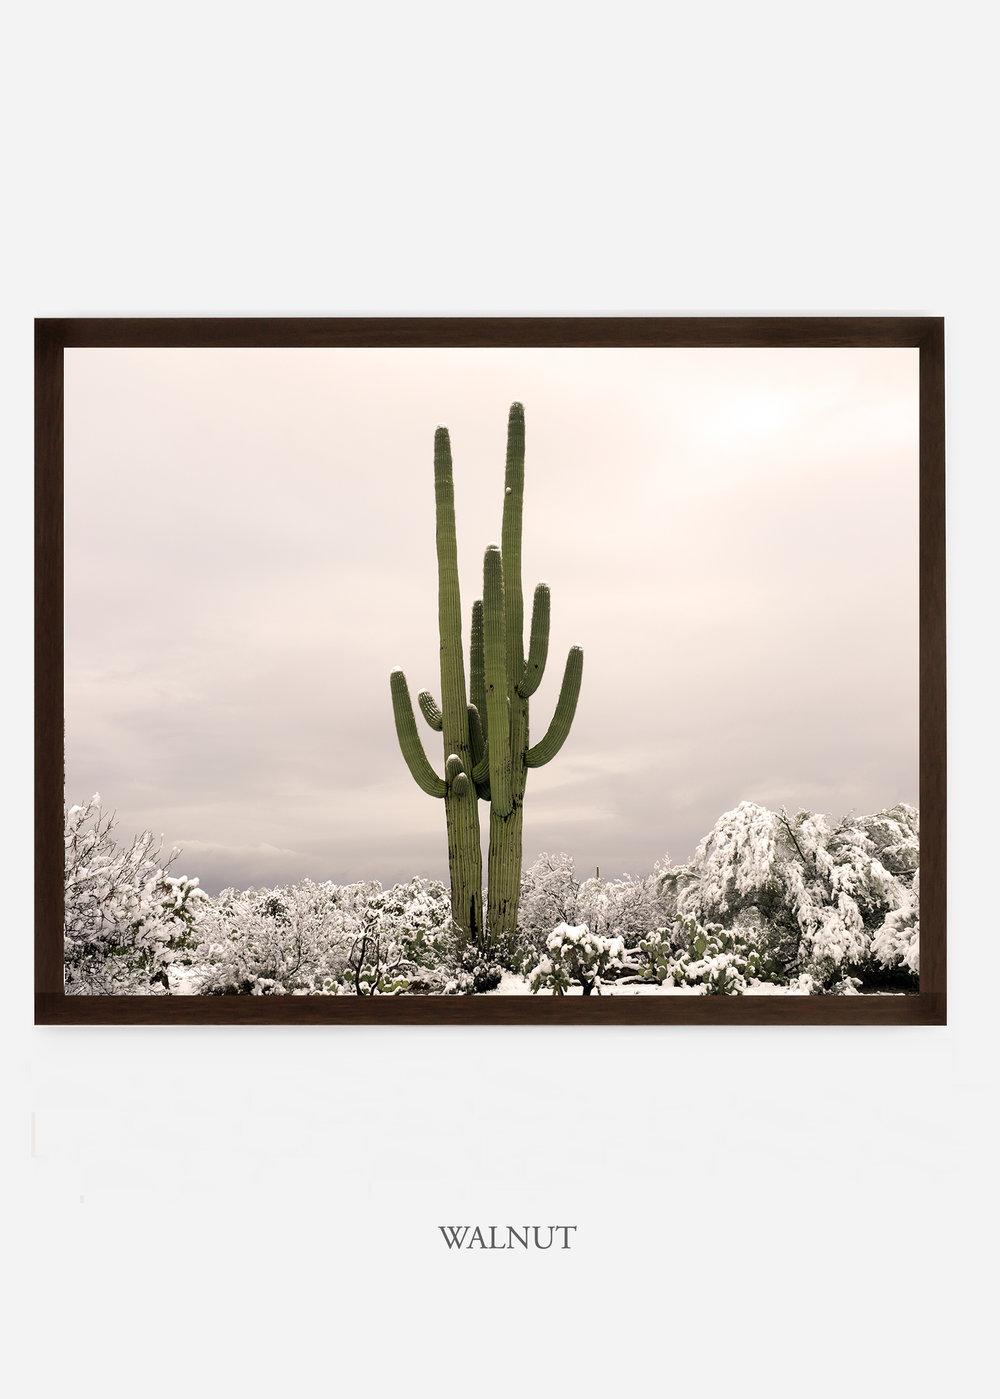 nomat_walnutframe-saguaroNo.5-wildercalifornia-art-wallart-cactusprint-homedecor-prints-arizona-botanical-artwork-interiordesign.jpg